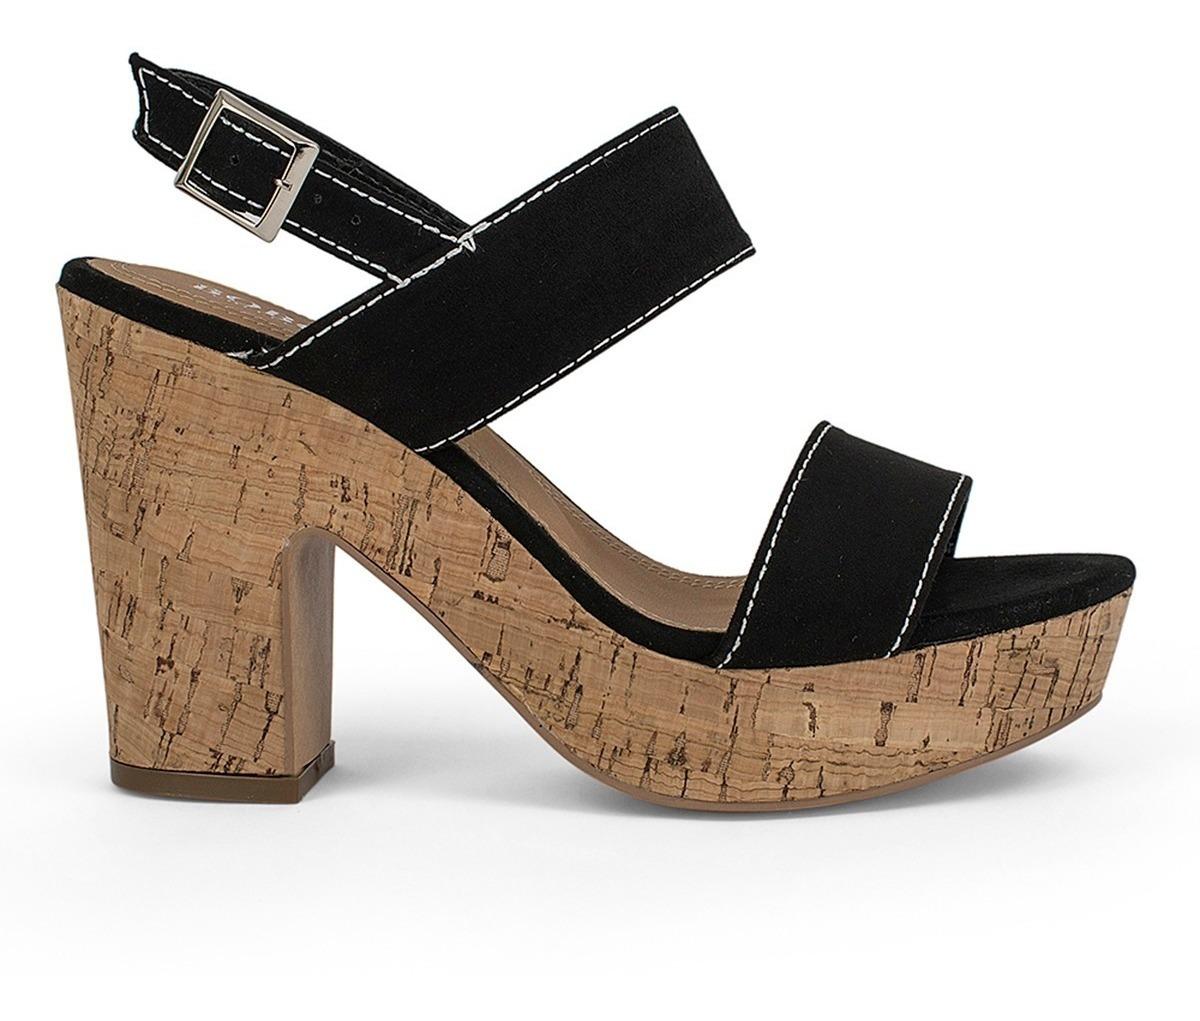 buscar auténtico gran selección venta usa online Sandalias Zapatos Dama Abiertos Tacon Corcho Negros 9116